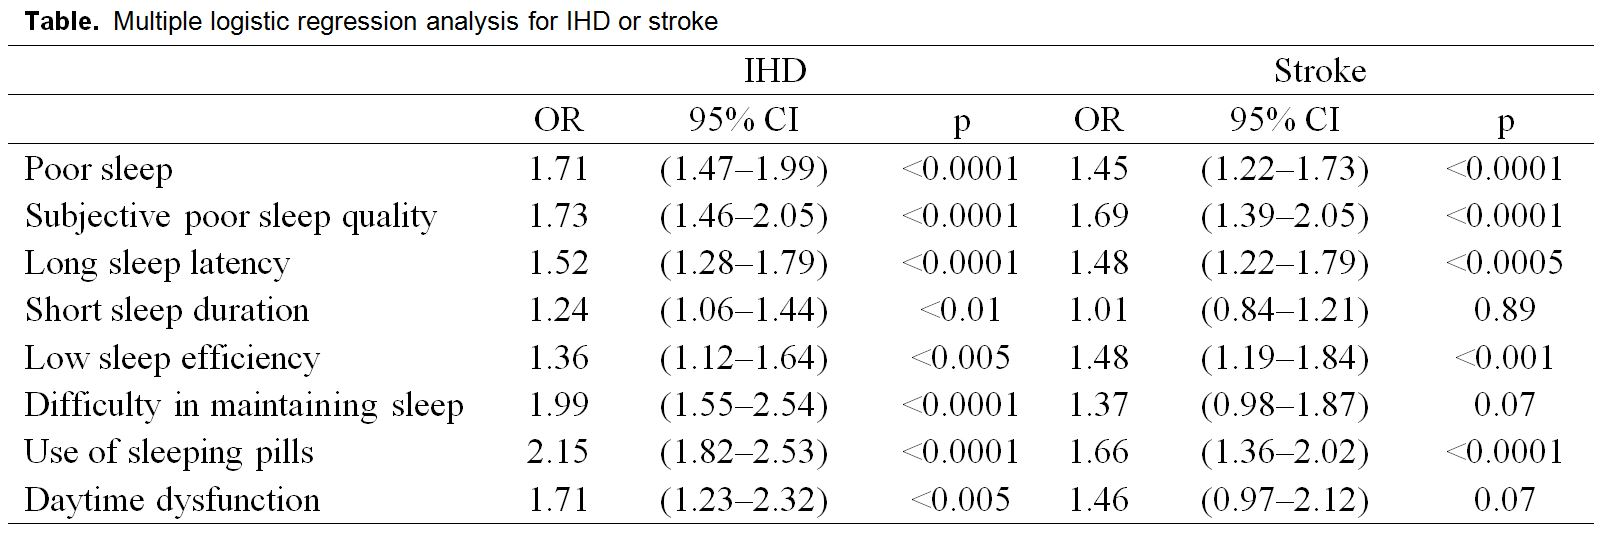 poor sleep is associated with ischaemic heart disease and stroke